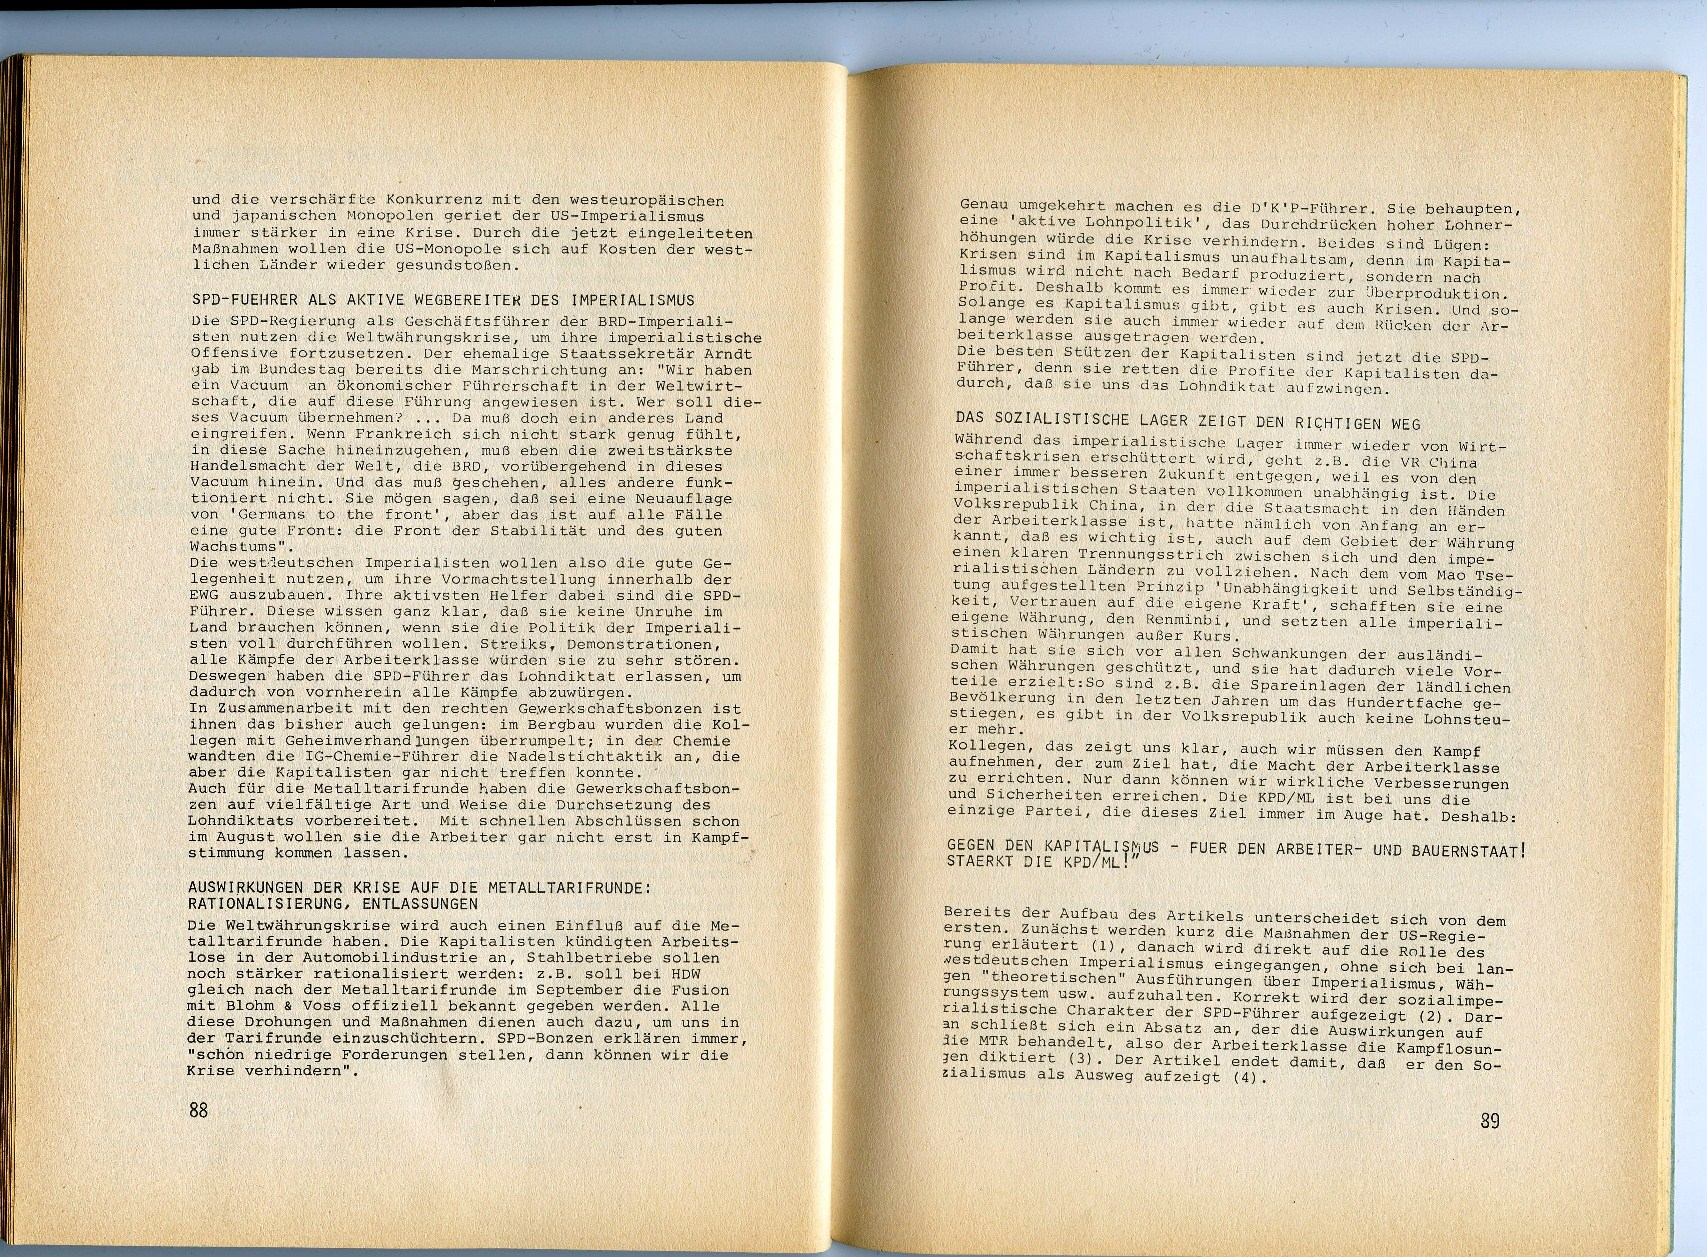 ZB_Parteiarbeiter_1971_08_46